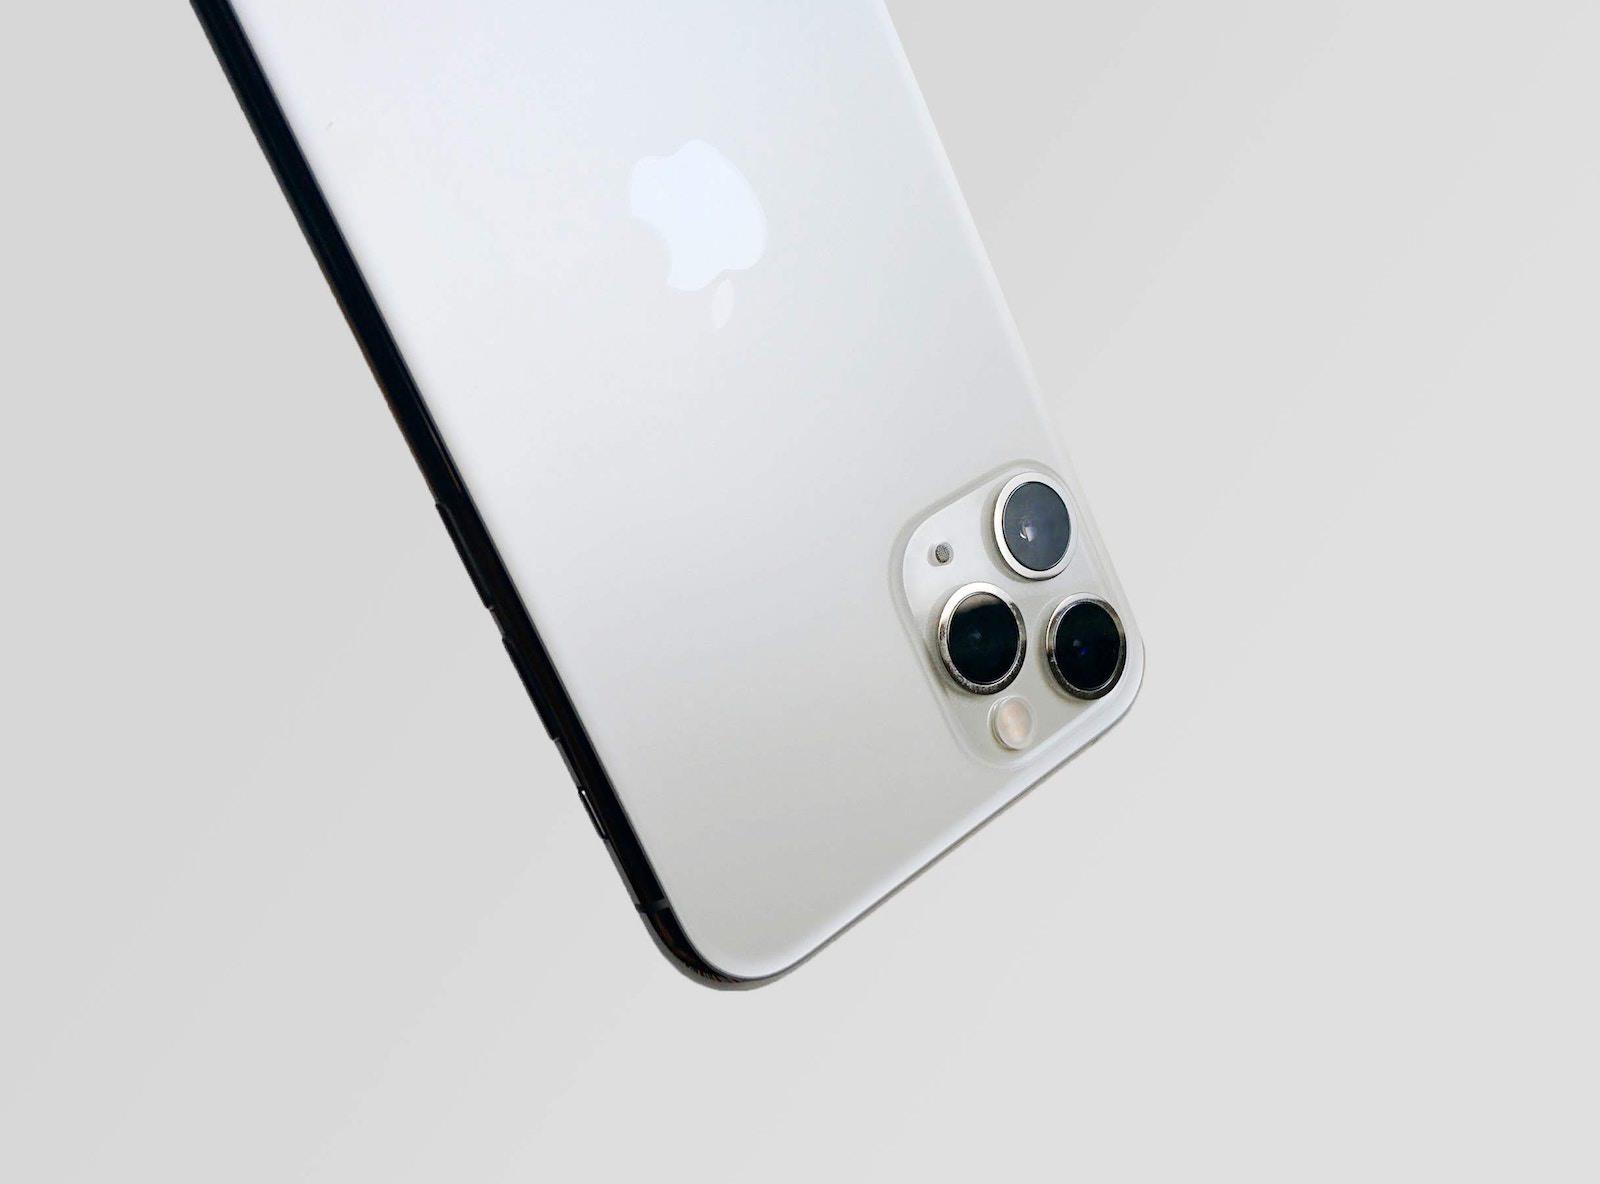 Vinoth ragunathan zSXMNCf4szU unsplash iphone11pro camera